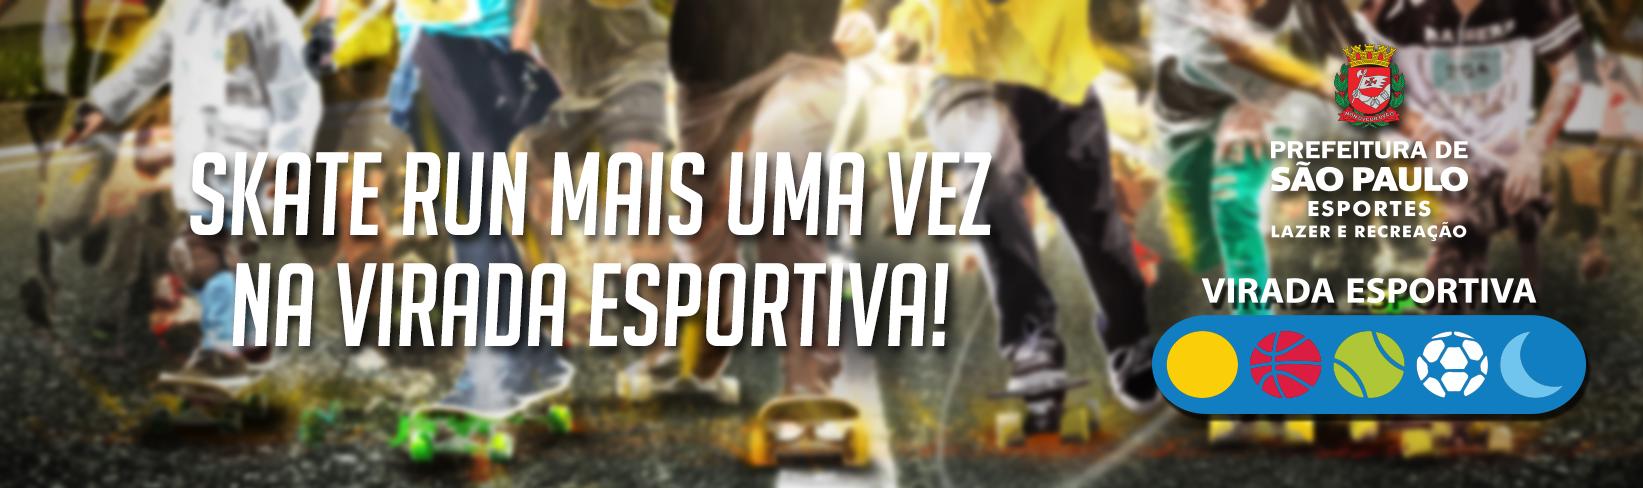 banner_site_virada_esportiva_skaterun